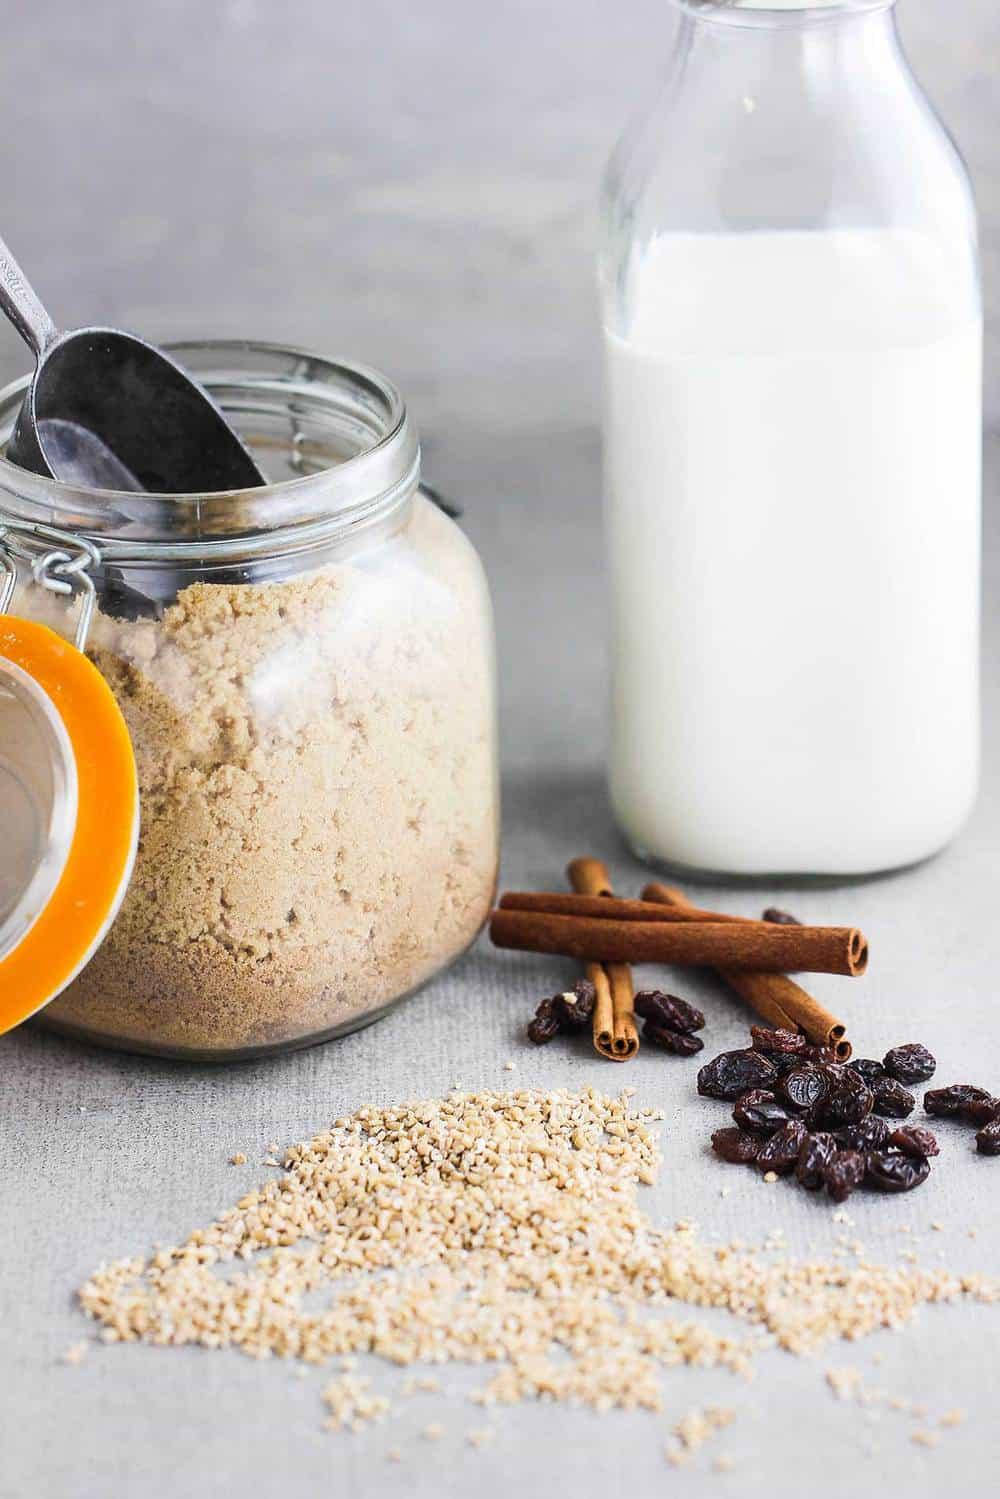 Instant Pot Cinnamon Raisin Steel-Cut Oatmeal recipe